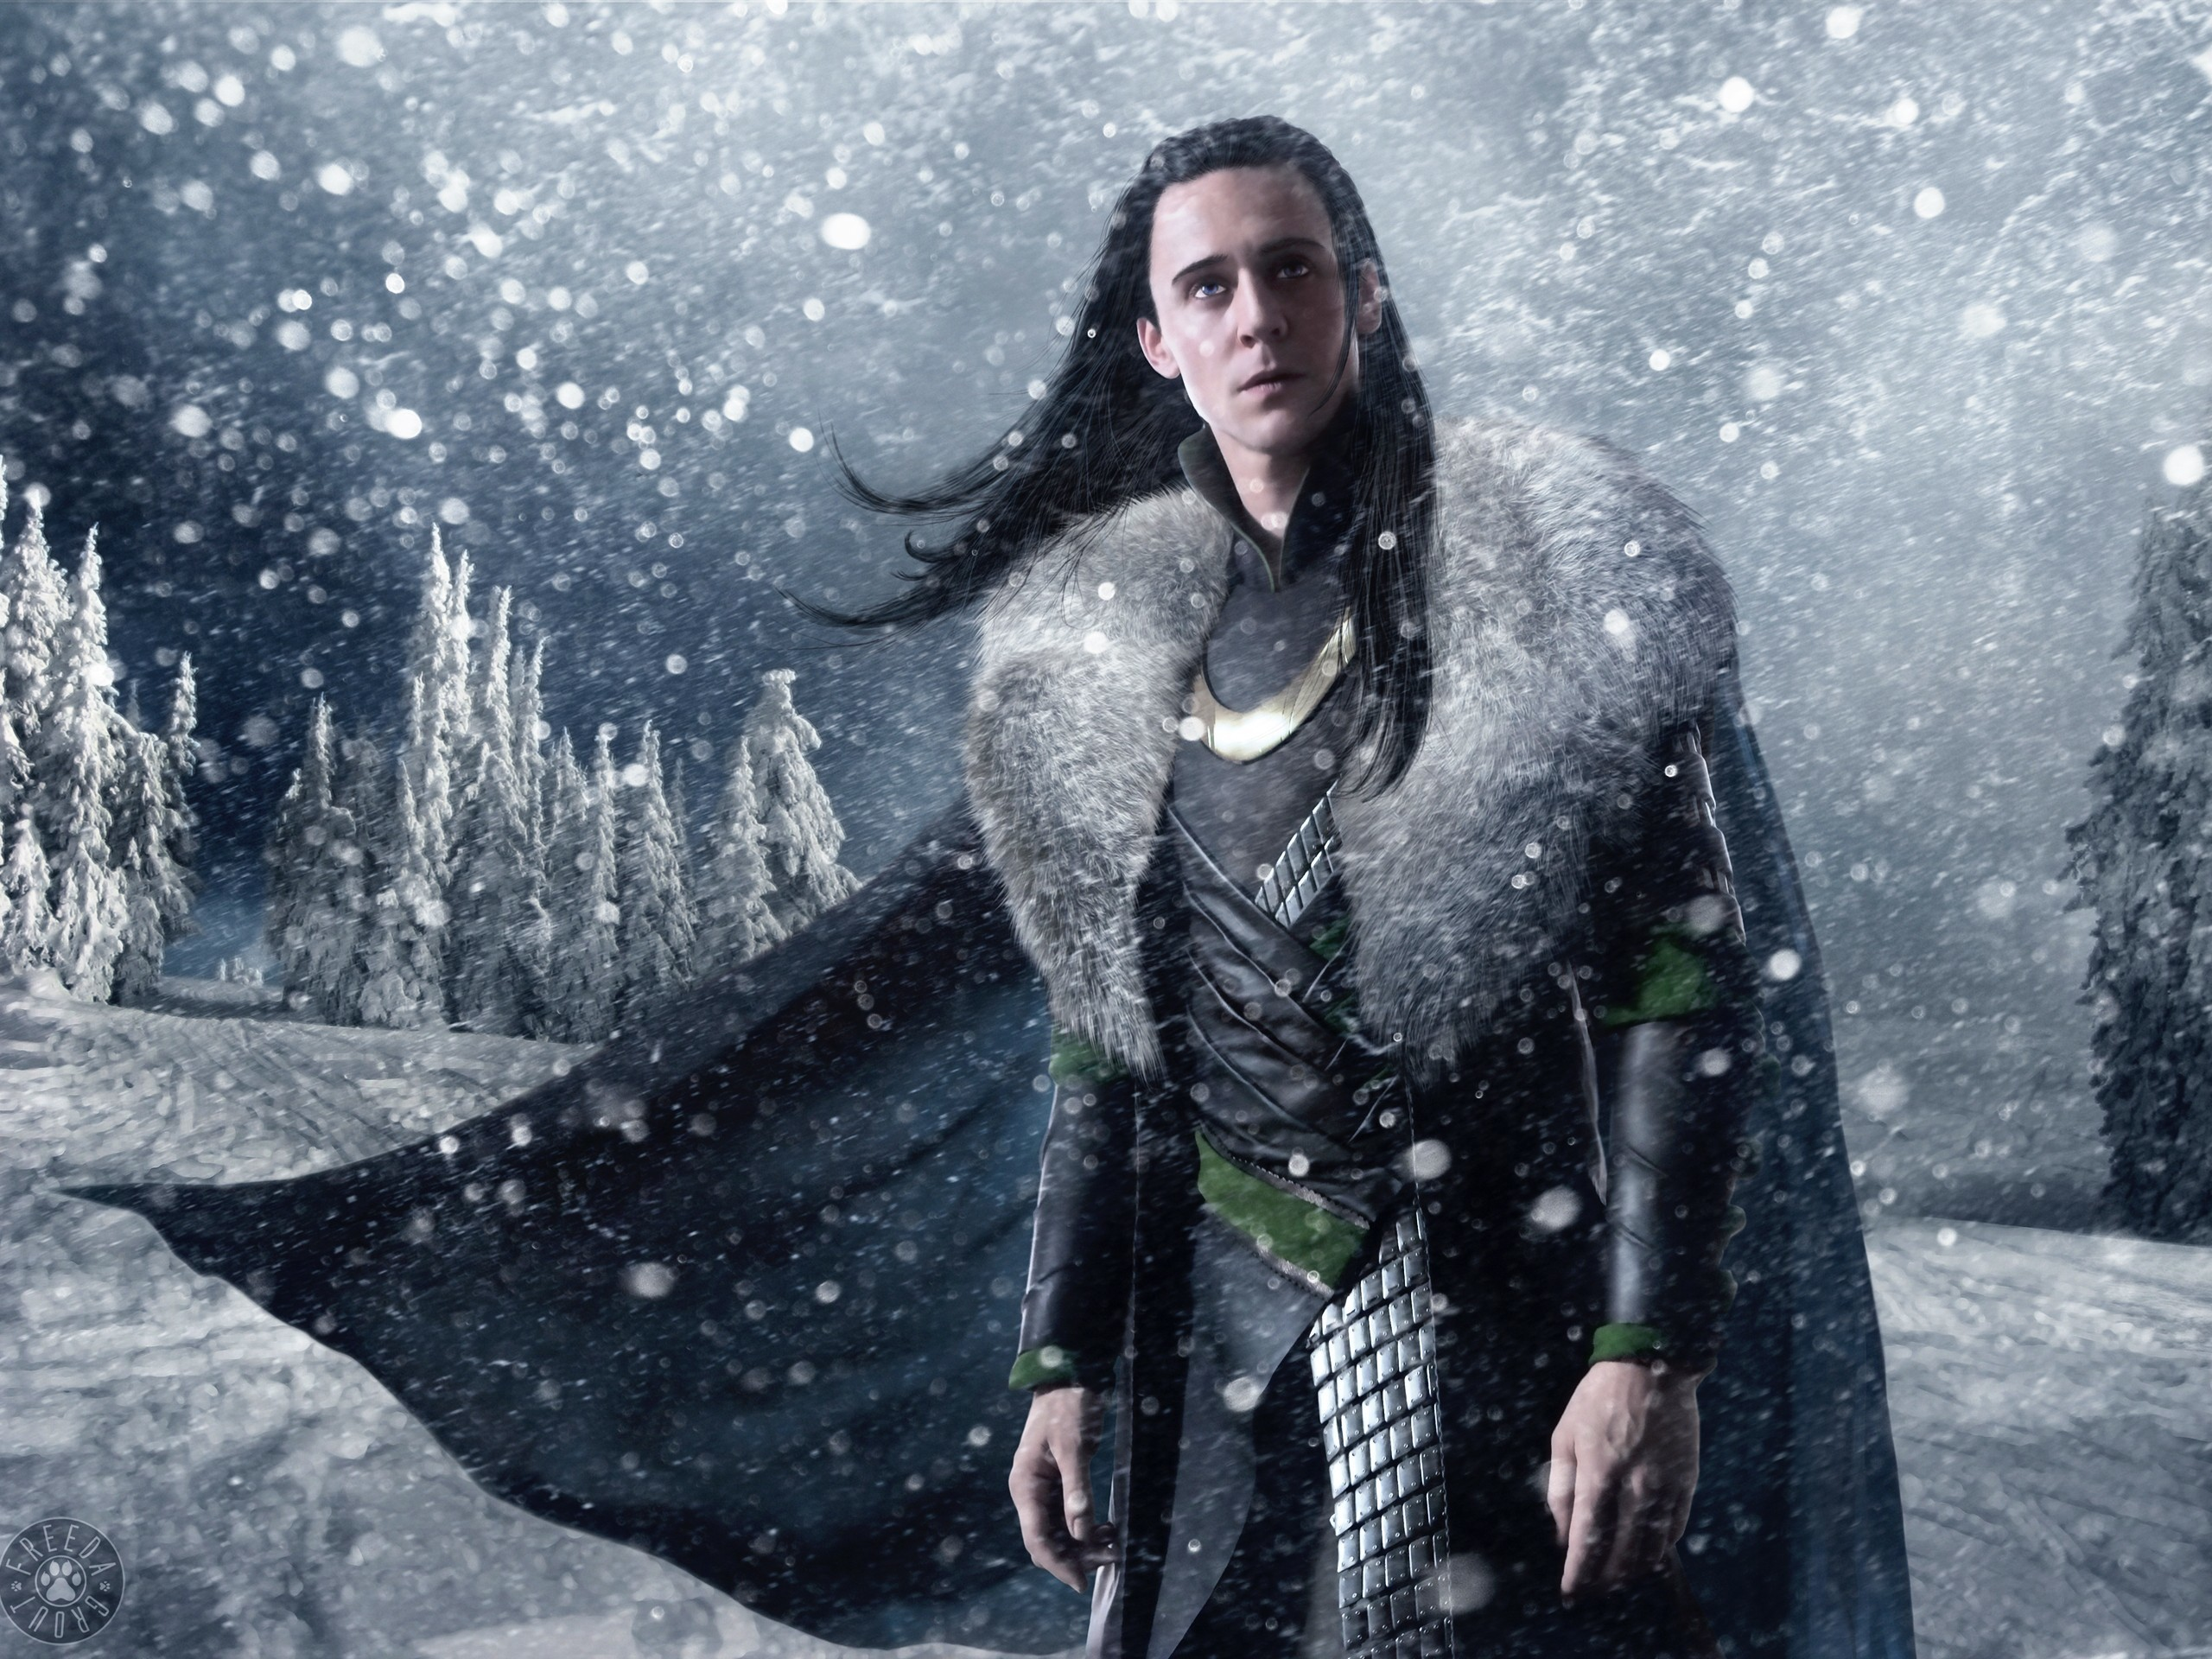 Snow trees cgi long hair artwork marvel comics loki tom hiddleston fan art  armour thor (